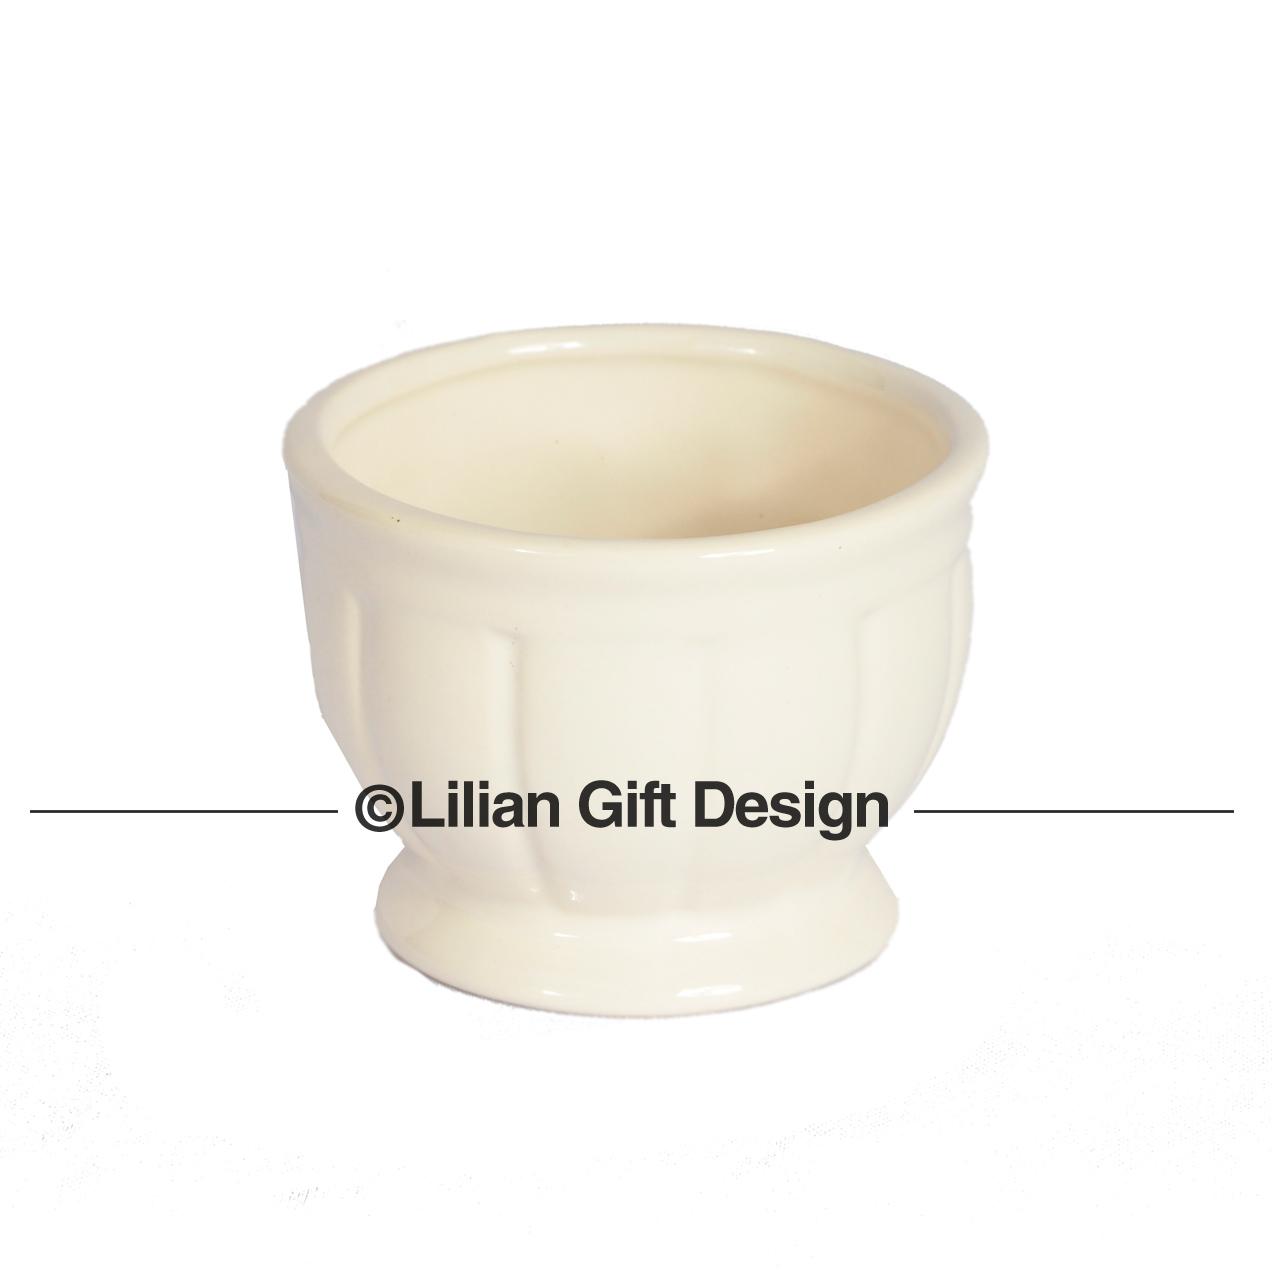 Vaso cerâmica branco 8.5x6cm